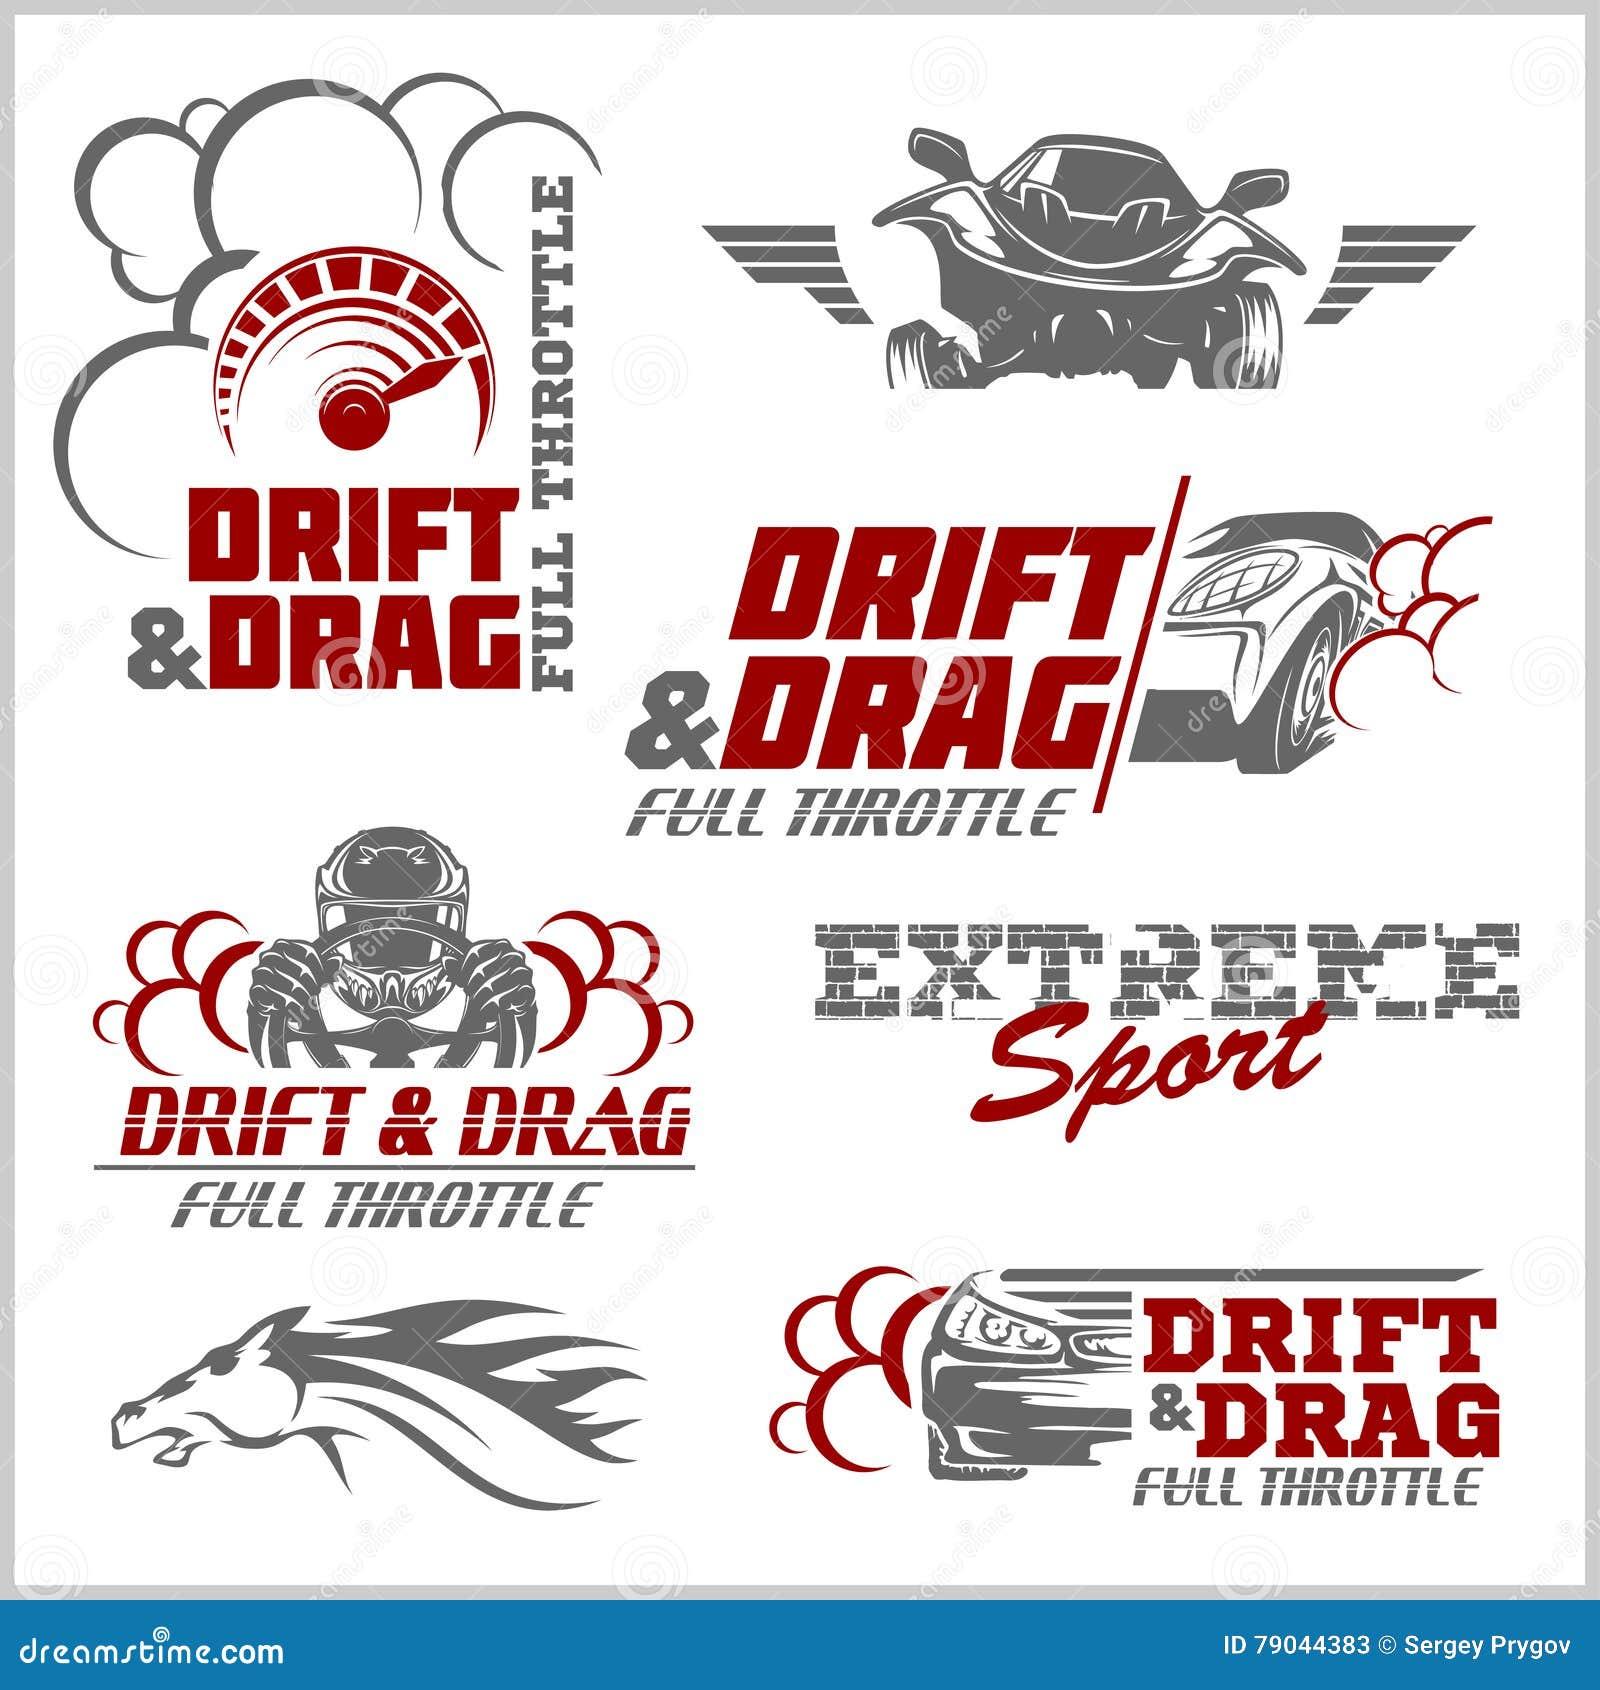 Drift Drag Racing Tuning Motor Sport Set Of Cars Logo Stock Vector Illustration Of Black Design 79044383